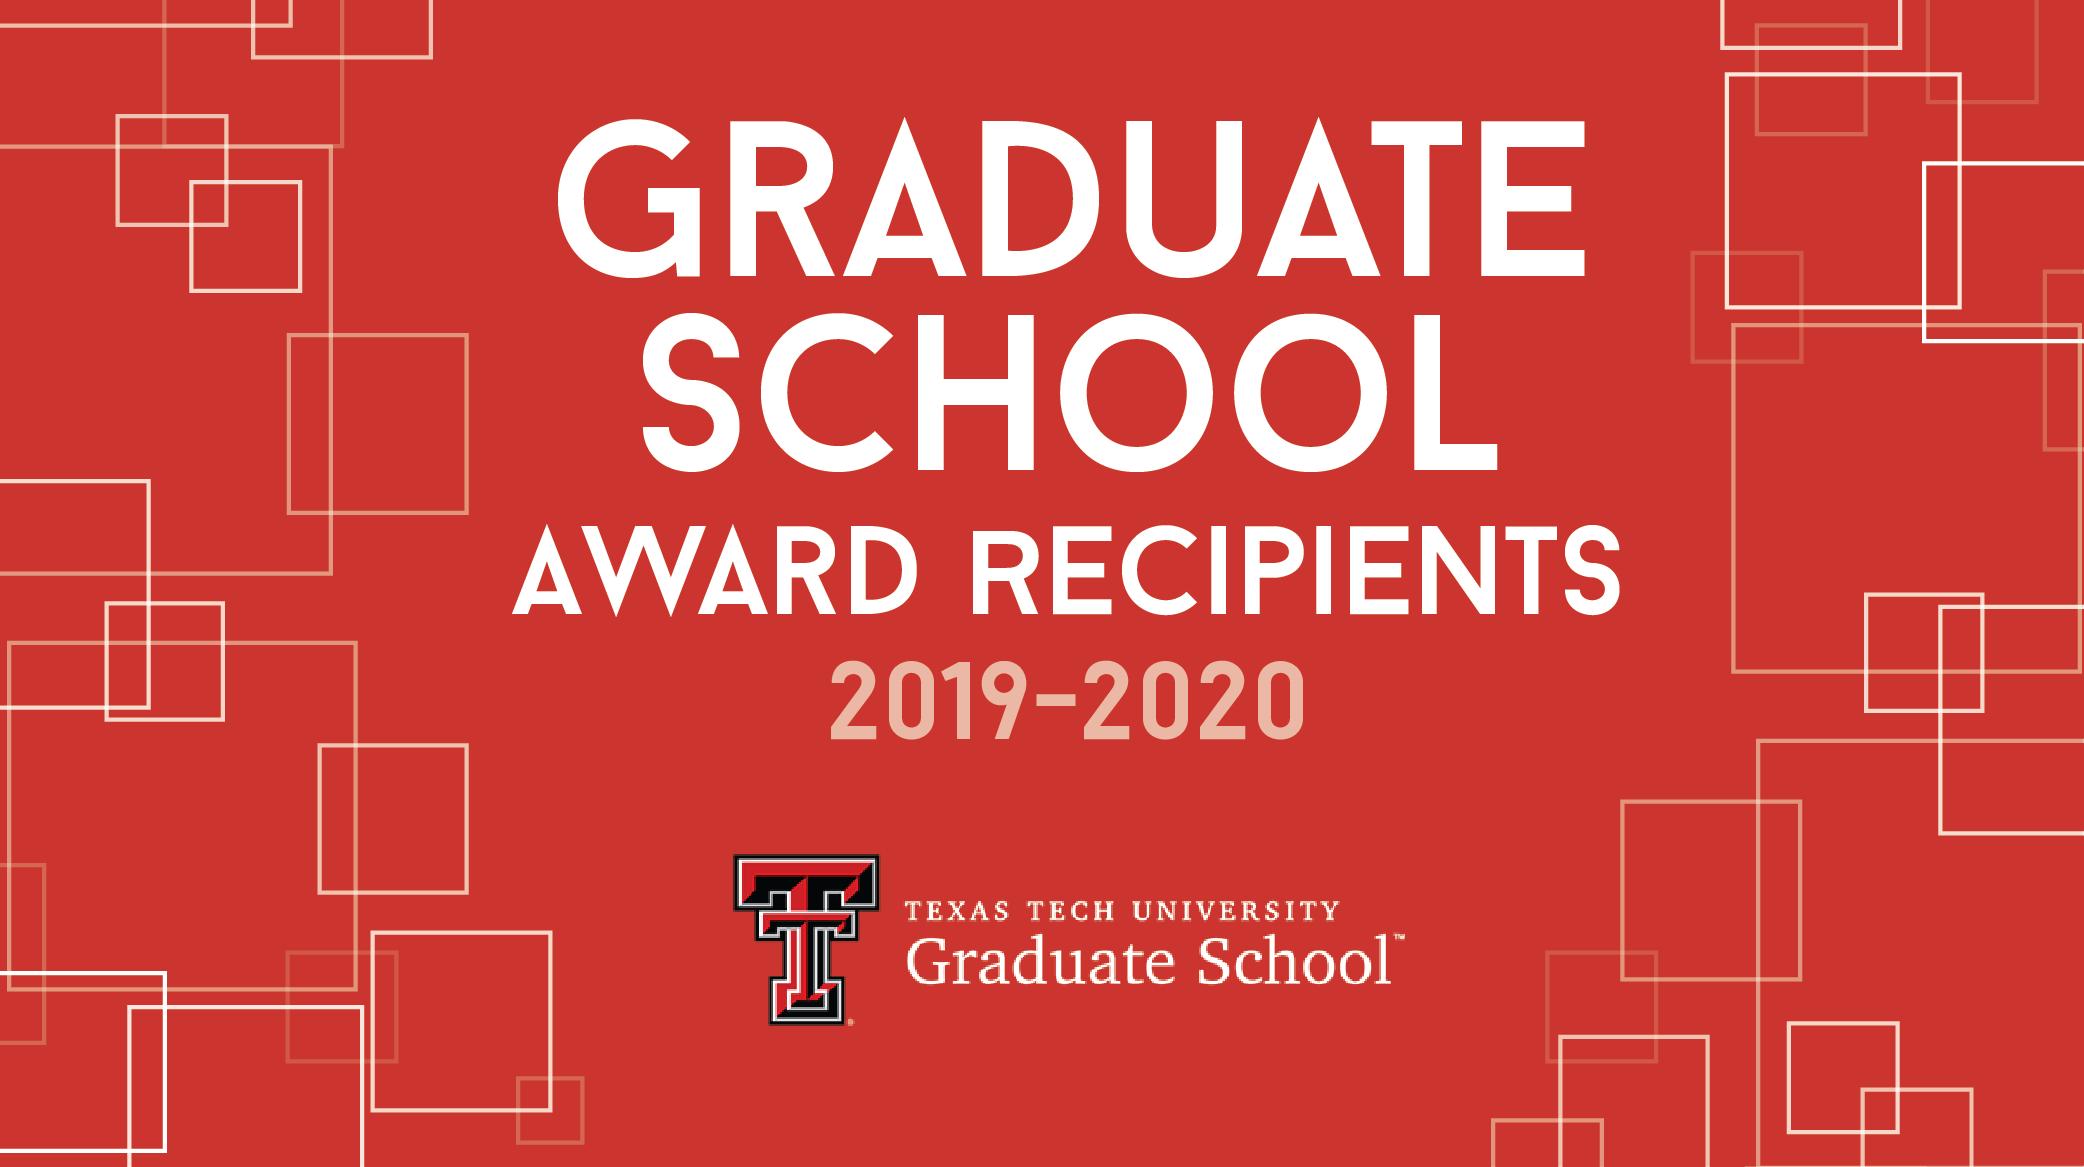 Texas Tech Graduate School | Graduate School | Ttu Intended For Texas Tech University Holiday Schedule 2021